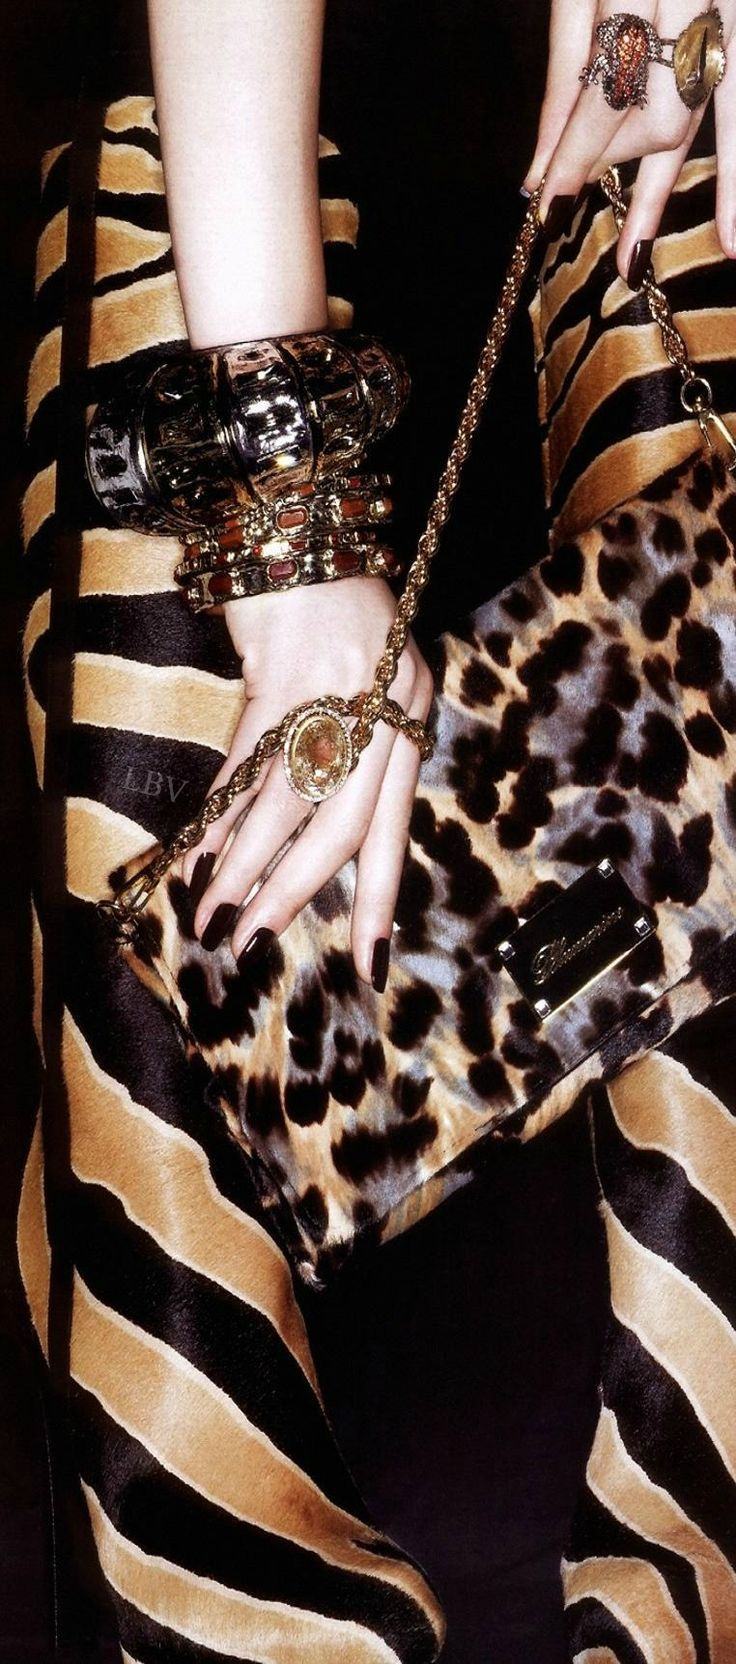 Animal Print fashion, editorial   LBV ♥✤